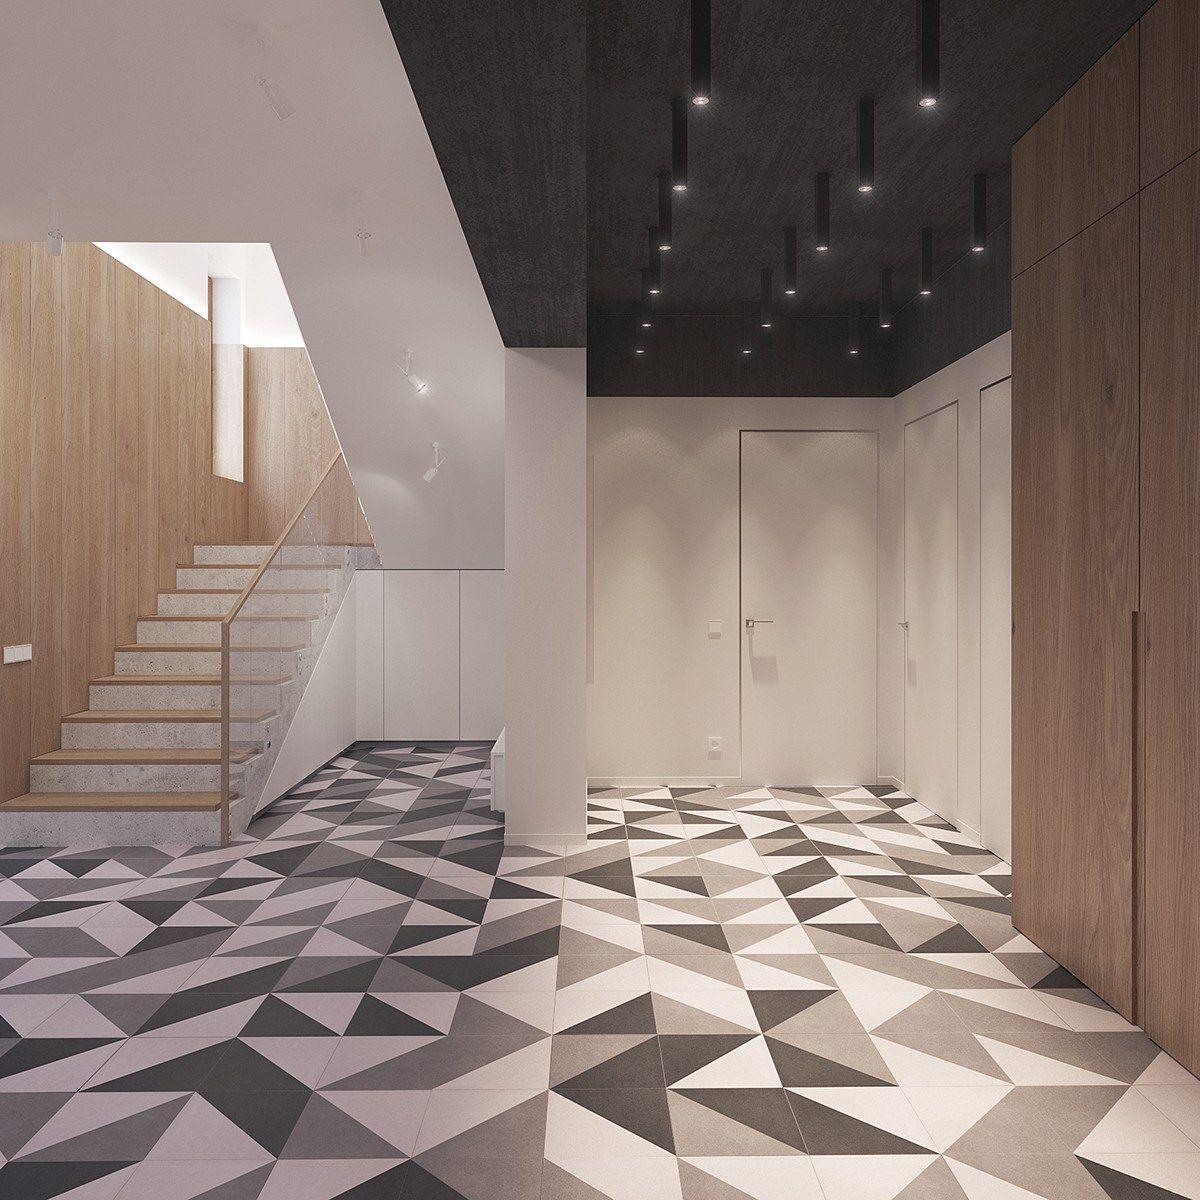 cdn.home-designing.com wp-content uploads 2016 07 geometric-floor-tiles-in-greyscale.jpg